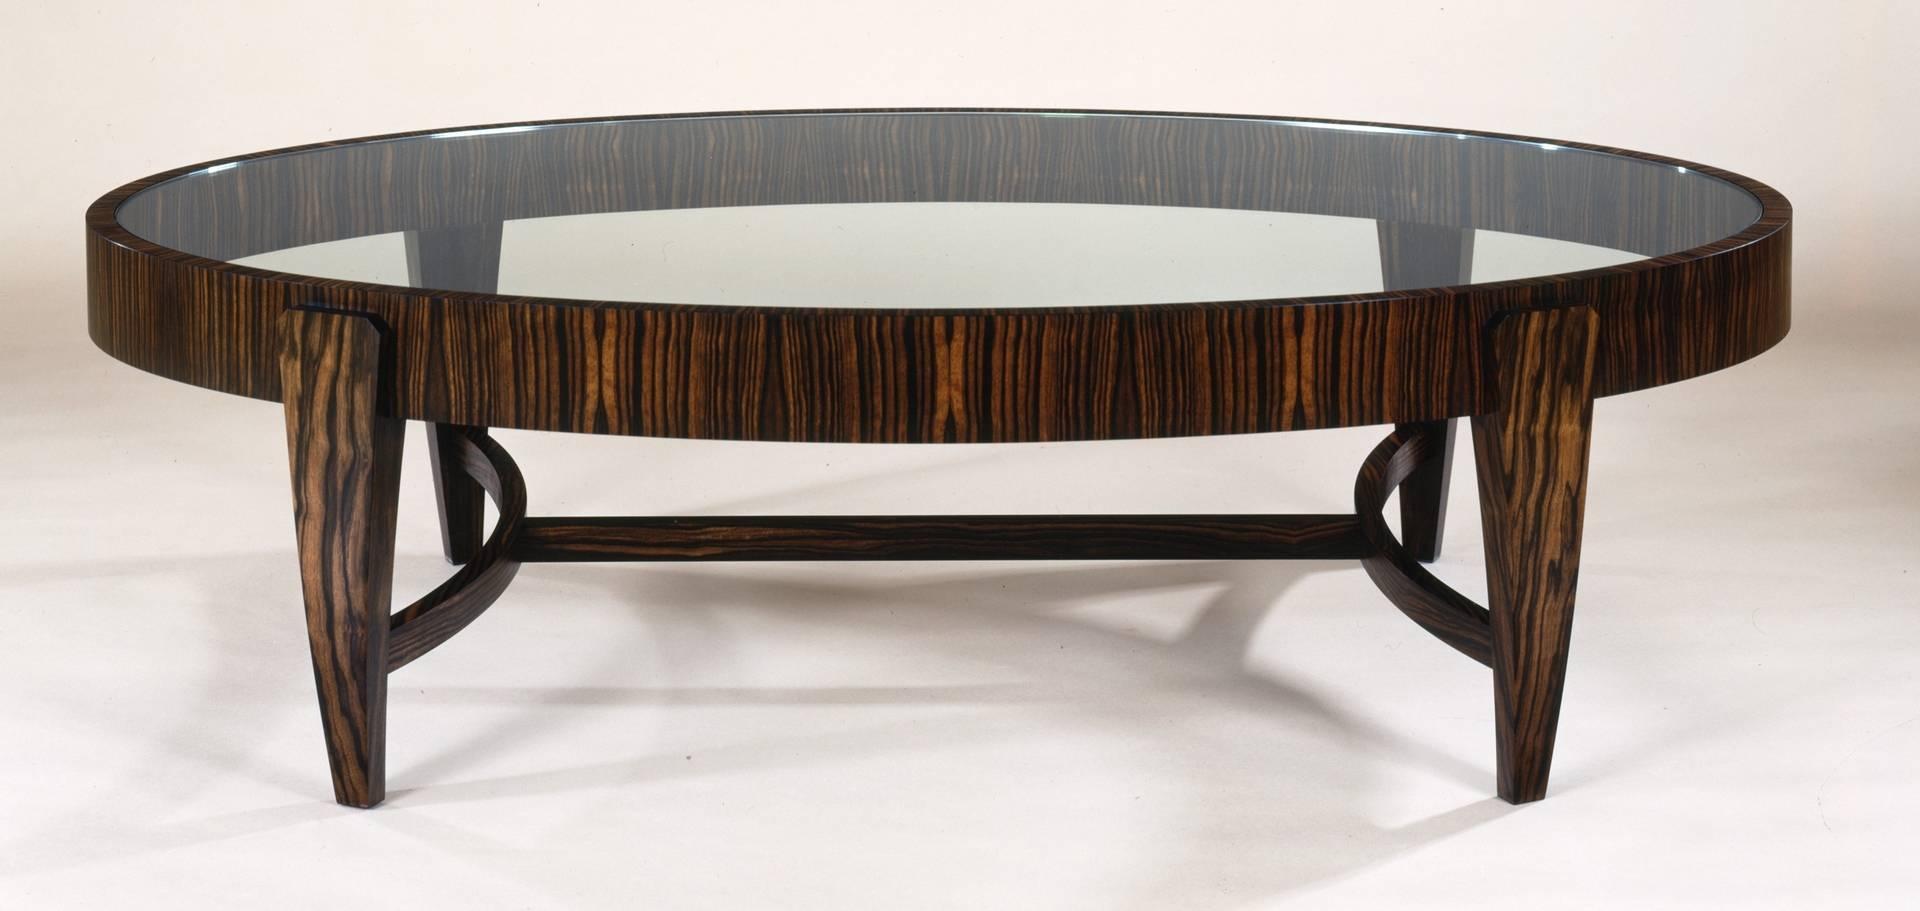 Oval Glass Coffee Table. Cofee Glass Top Coffee Table Set And inside Glass Topped Coffee Tables (Image 14 of 15)